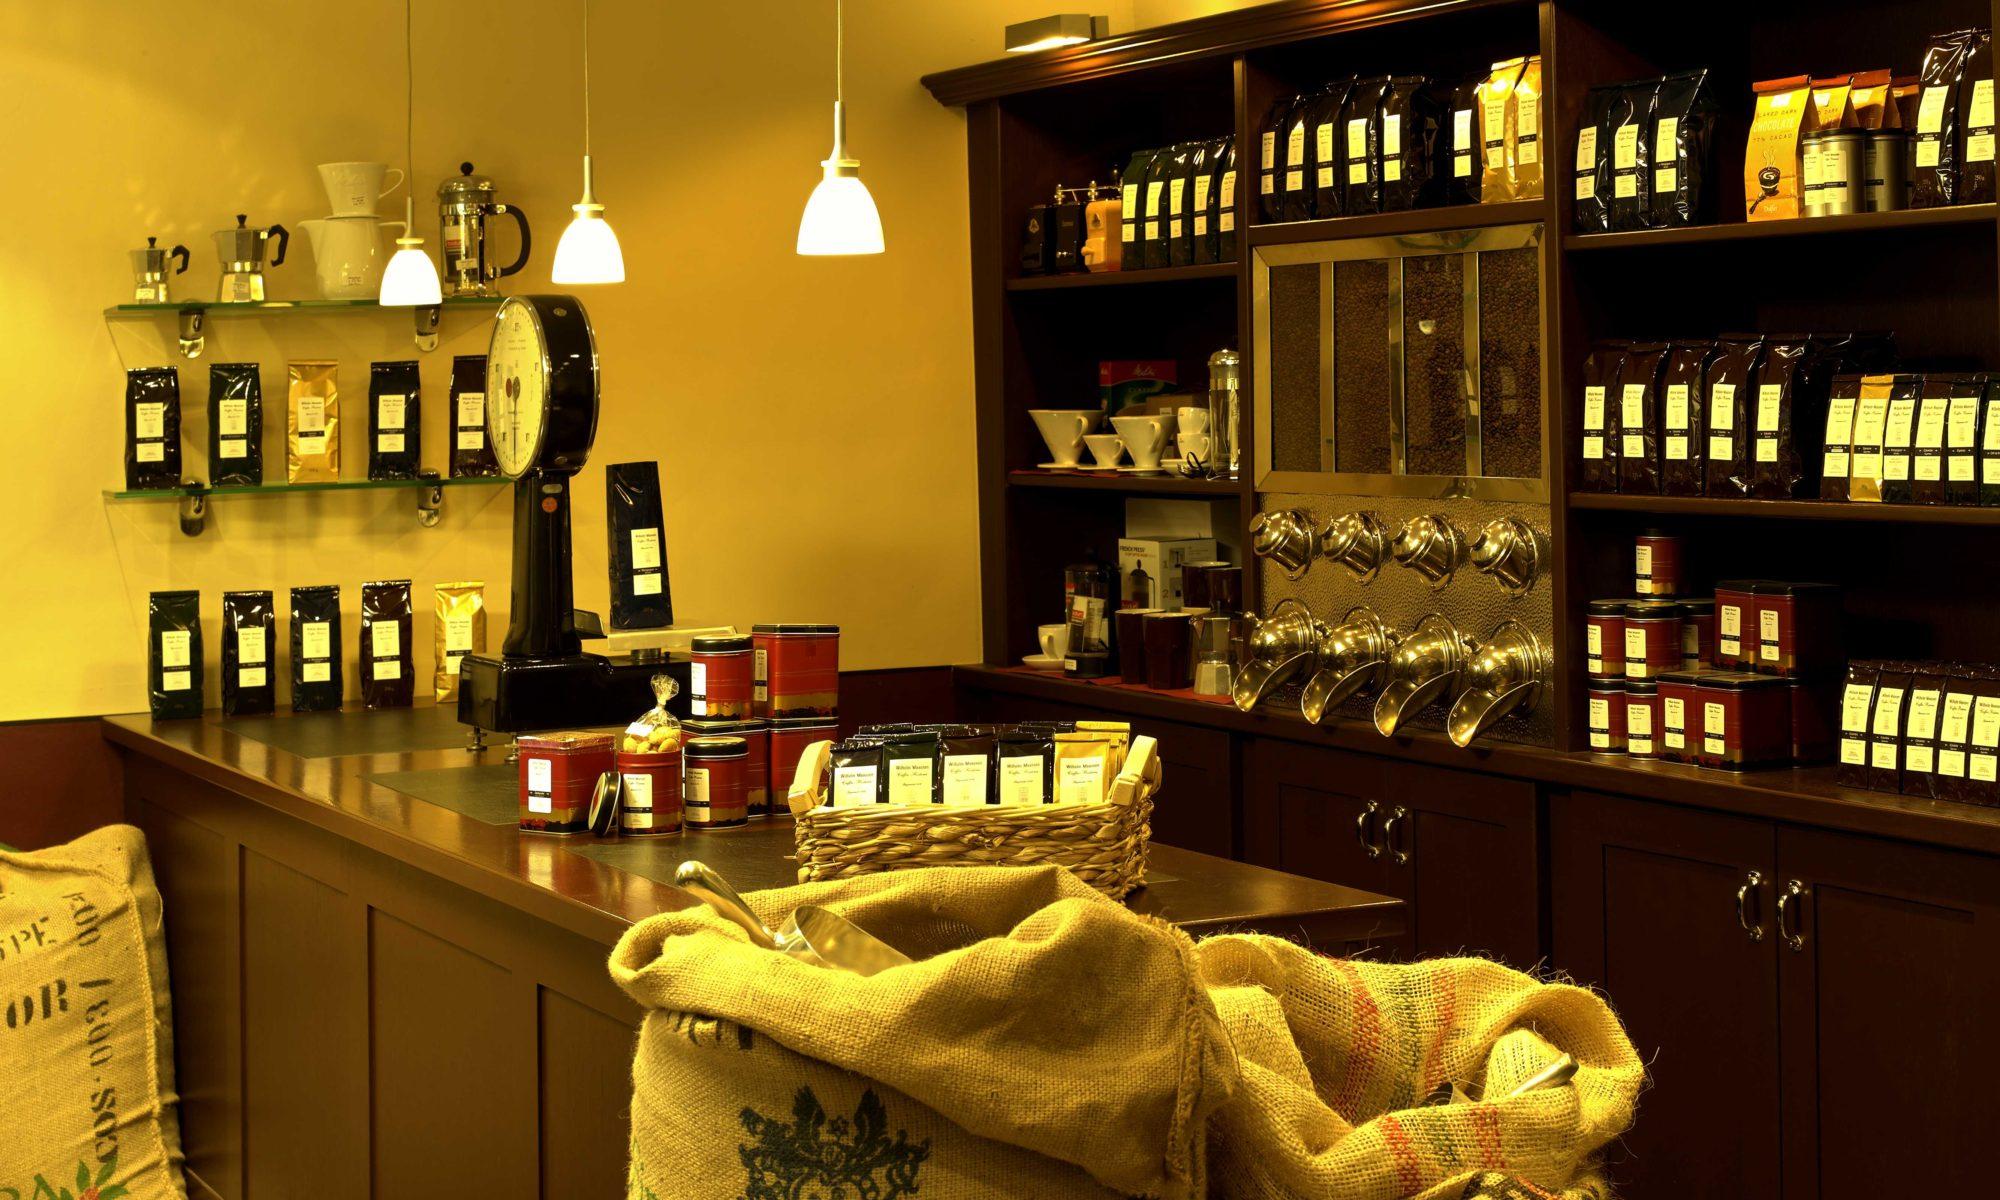 Caffee-Rösterei Wilh. Maassen